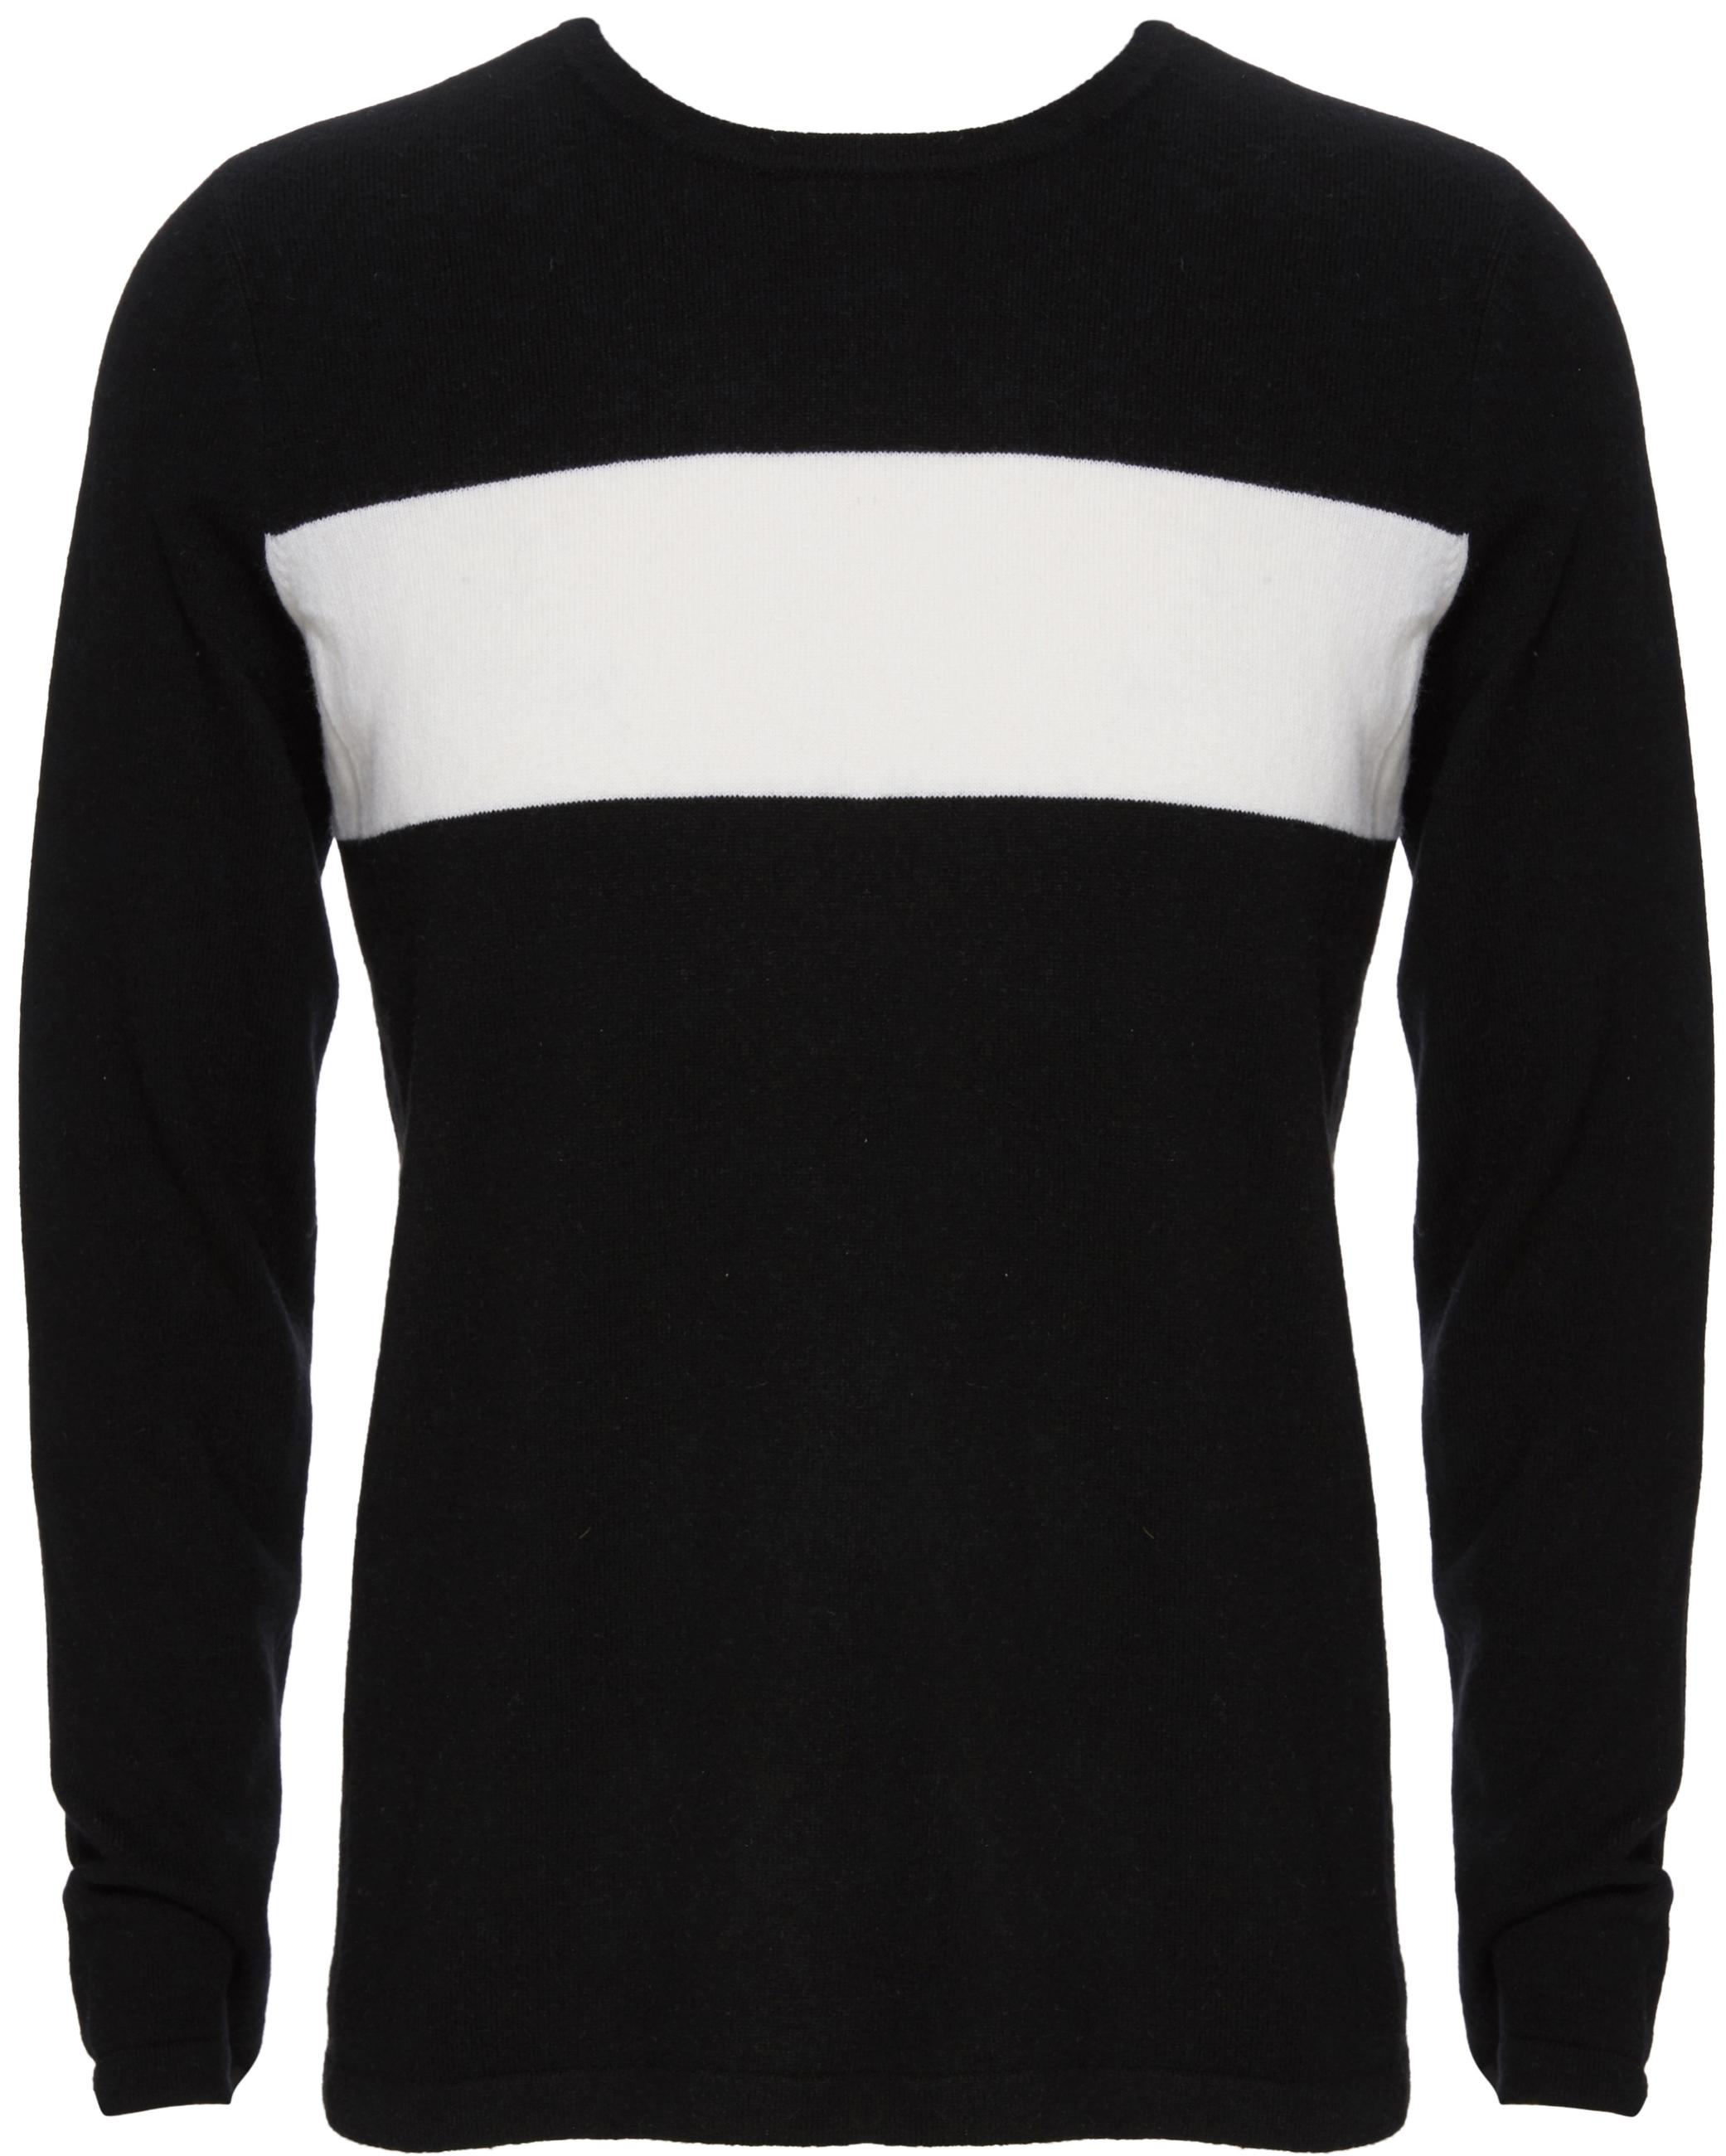 VINCE Wool Cashmere Block Stripe Crew Neck Sweater, $295